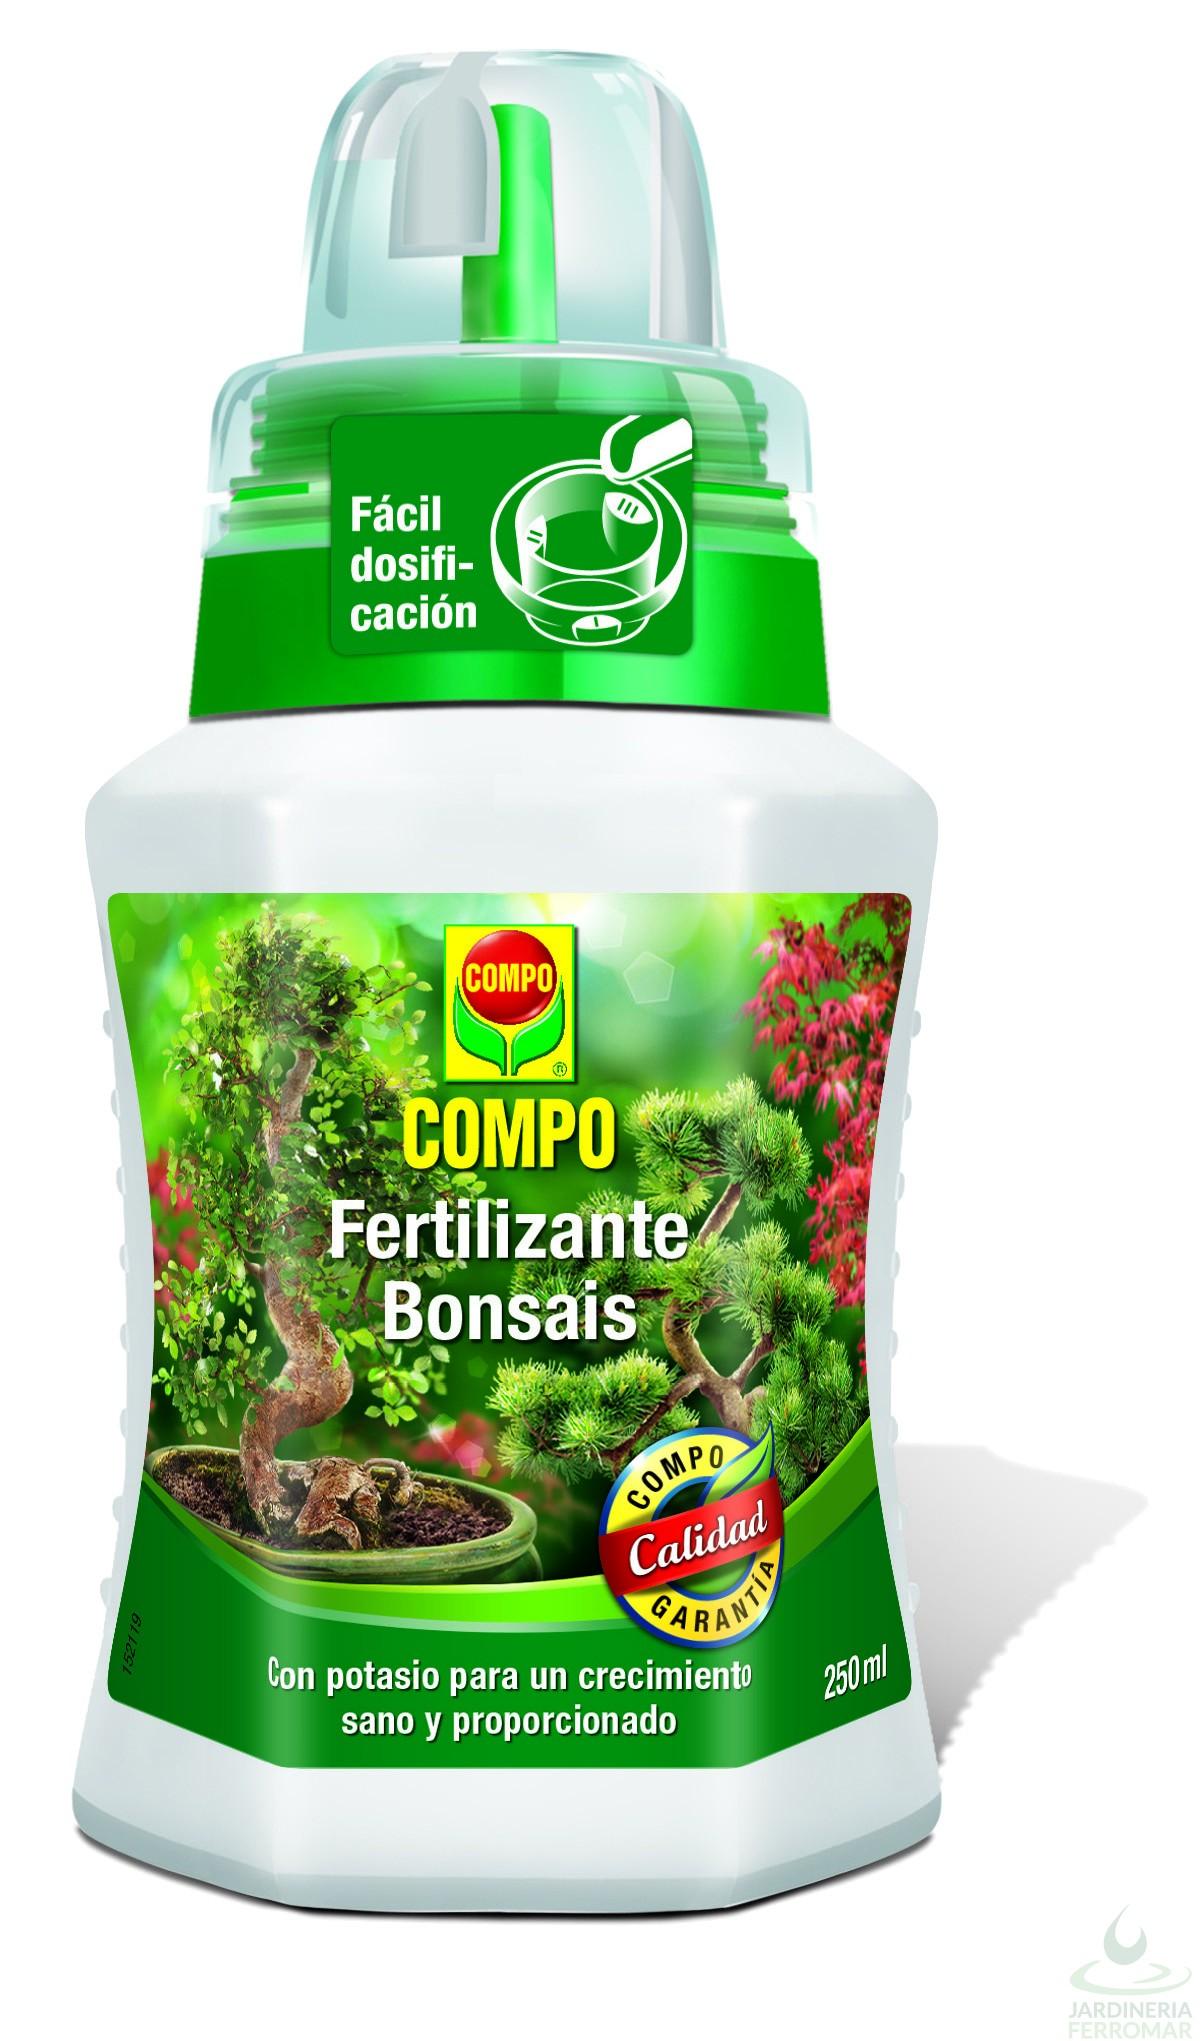 Compo fertilizante bonsais 500ml piscinas ferromar for Piscinas ferromar